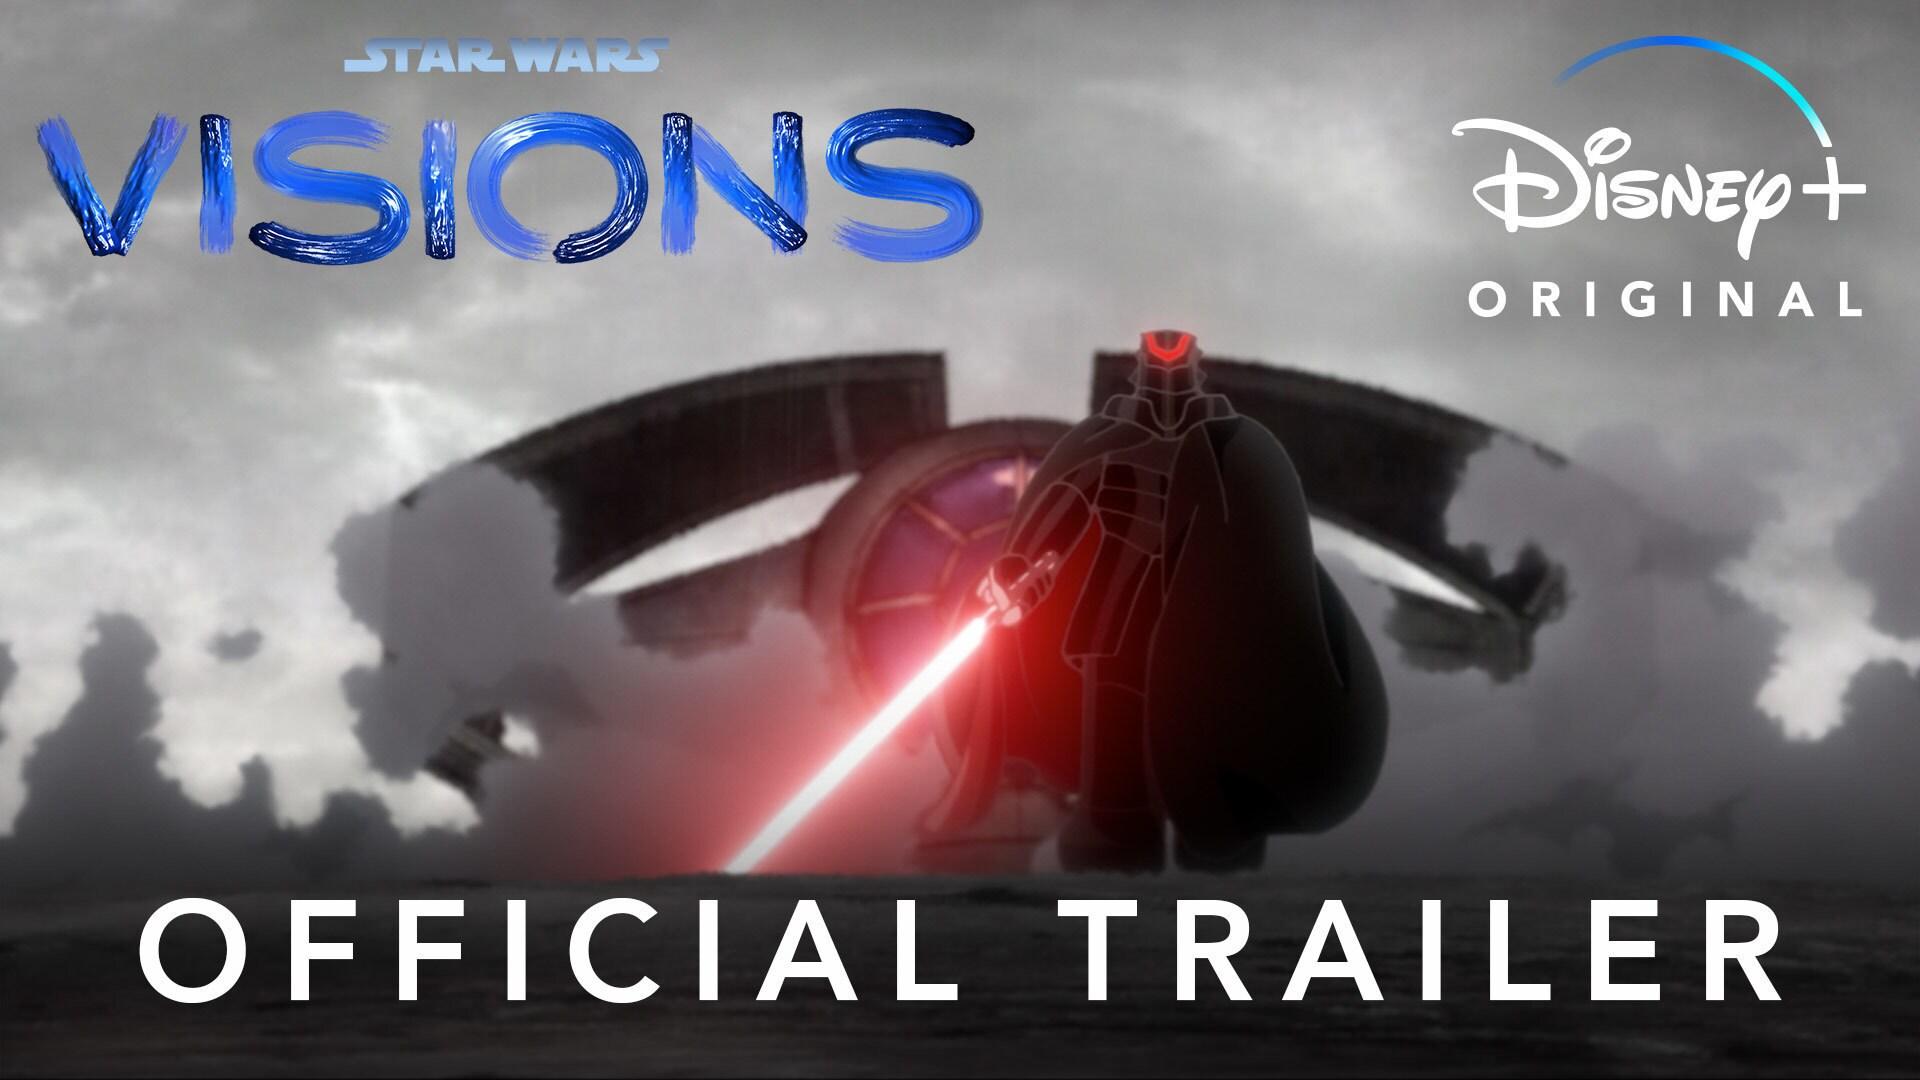 Original Trailer - Star Wars: Visions